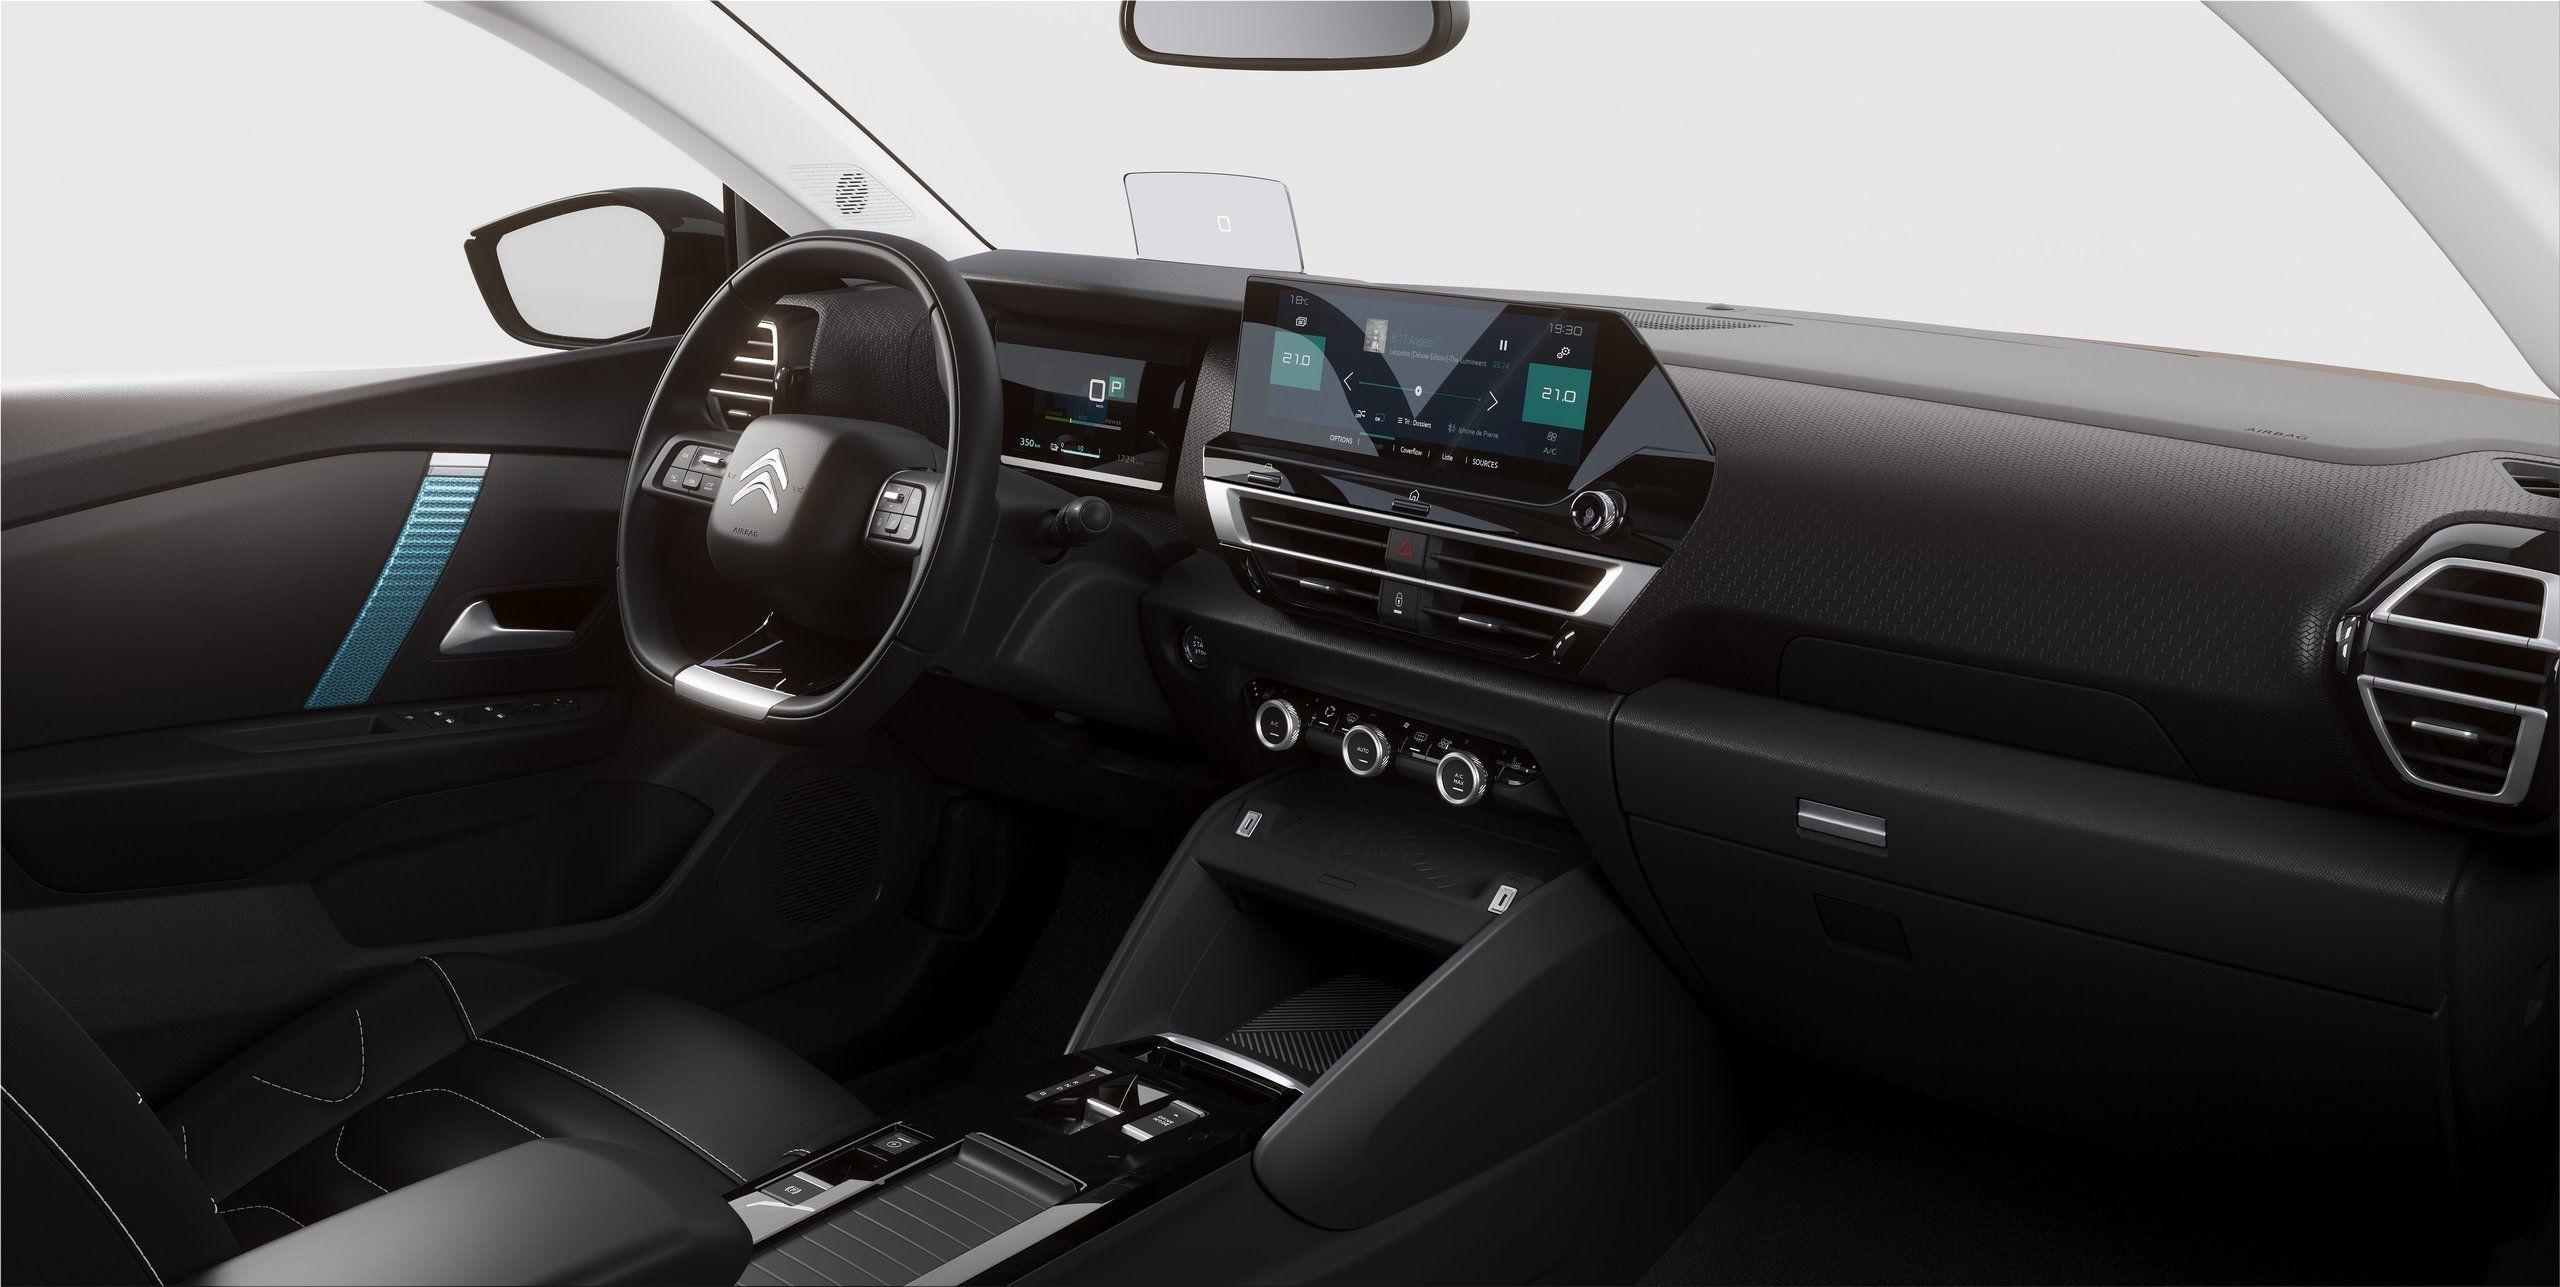 Citroën ë-C4 fully electric car #citroen #c4 #electriccar